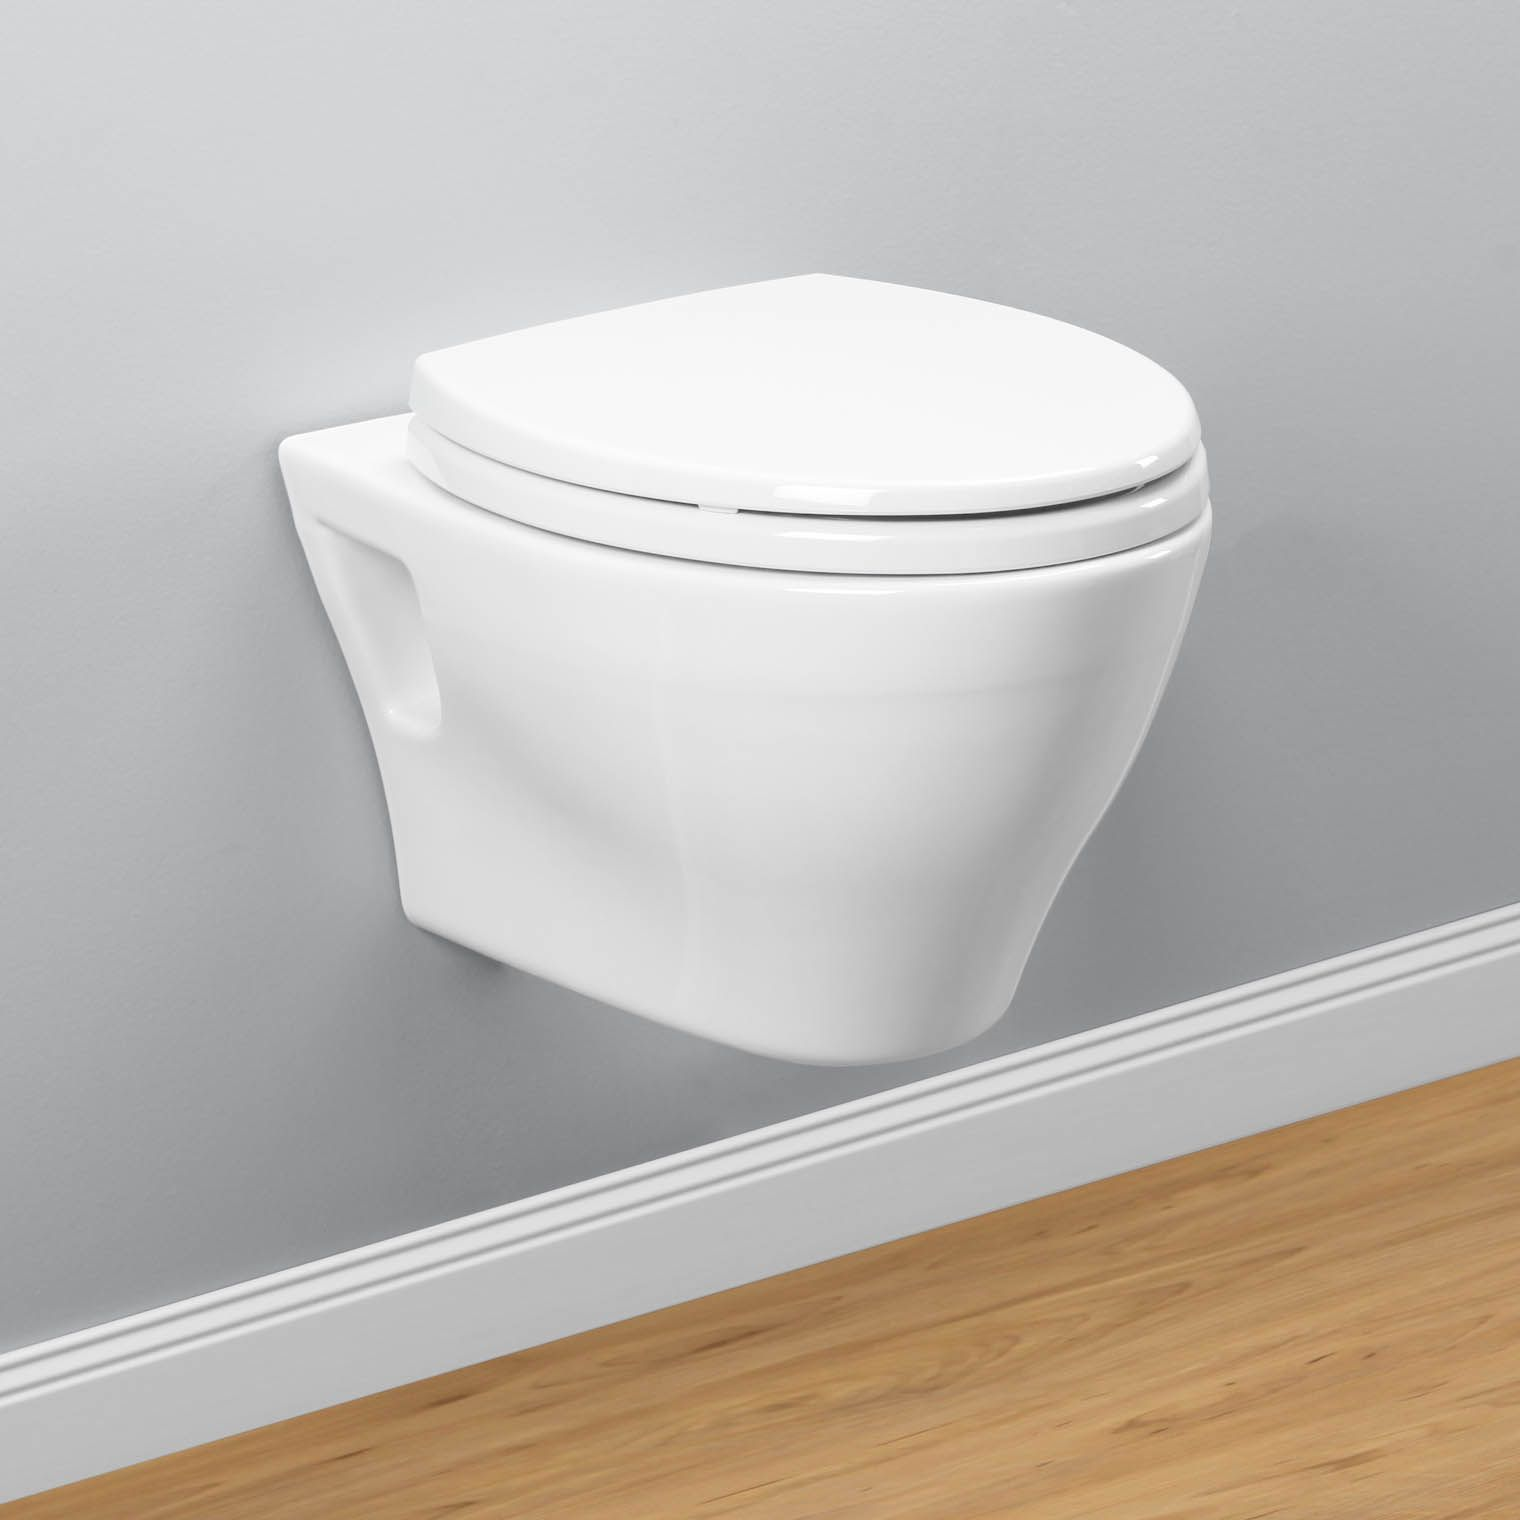 Aquia® Wall-Hung Dual-Flush Toilet, 1.6GPF u0026 0.9 GPF Dim